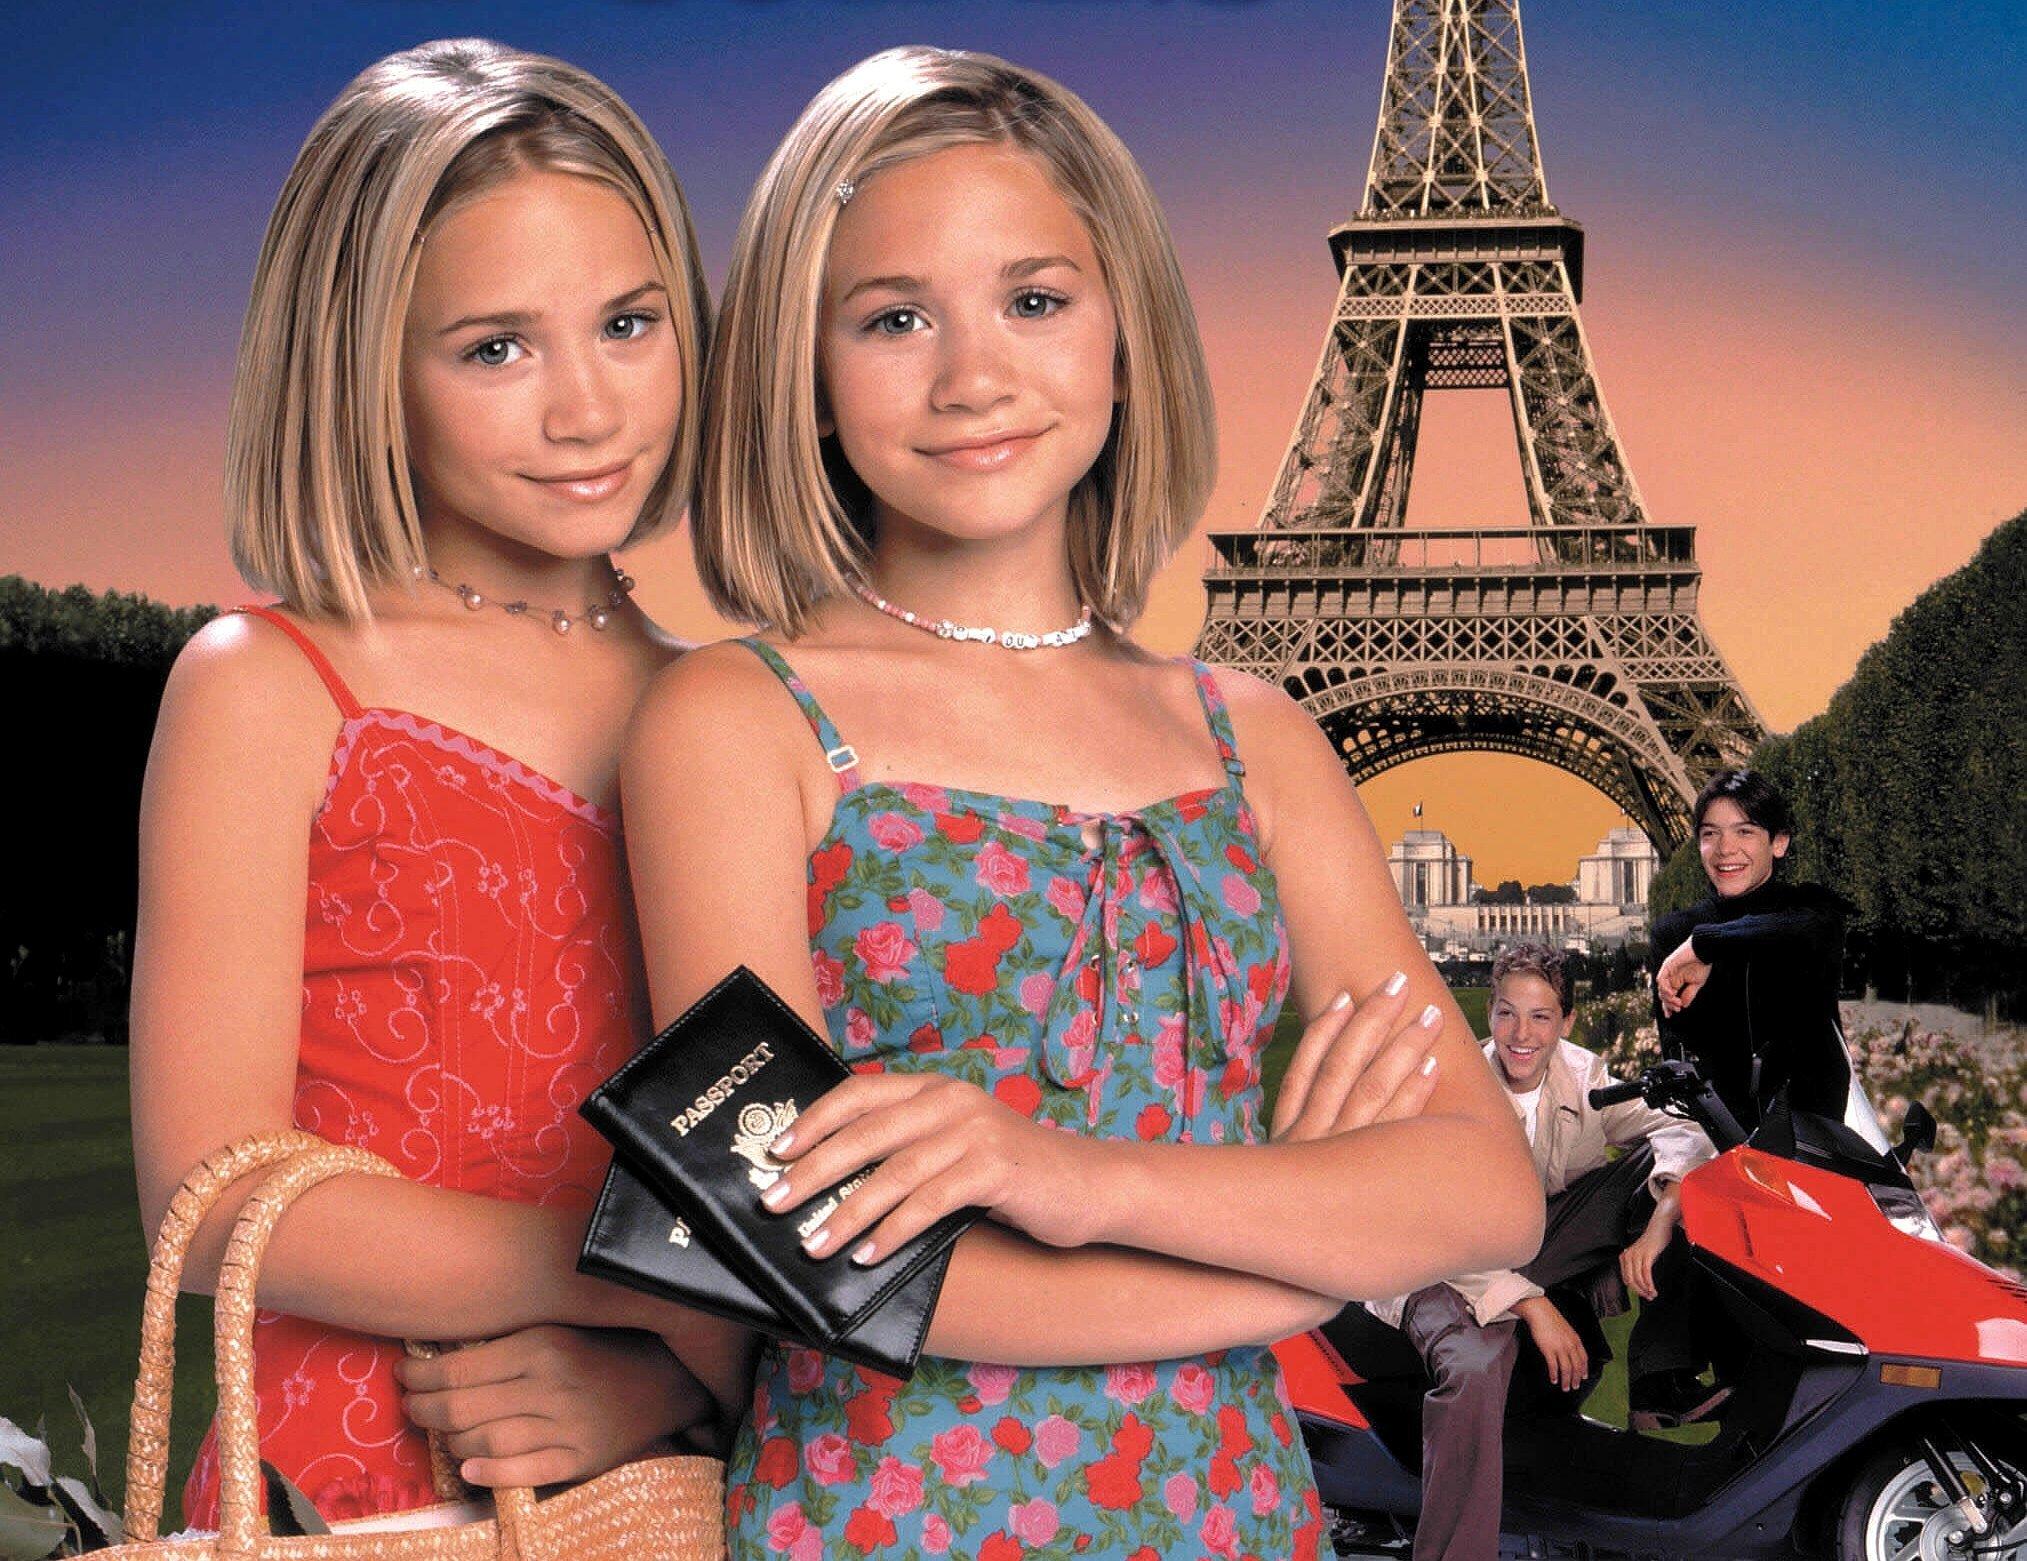 Olsen twins naked pic — img 10